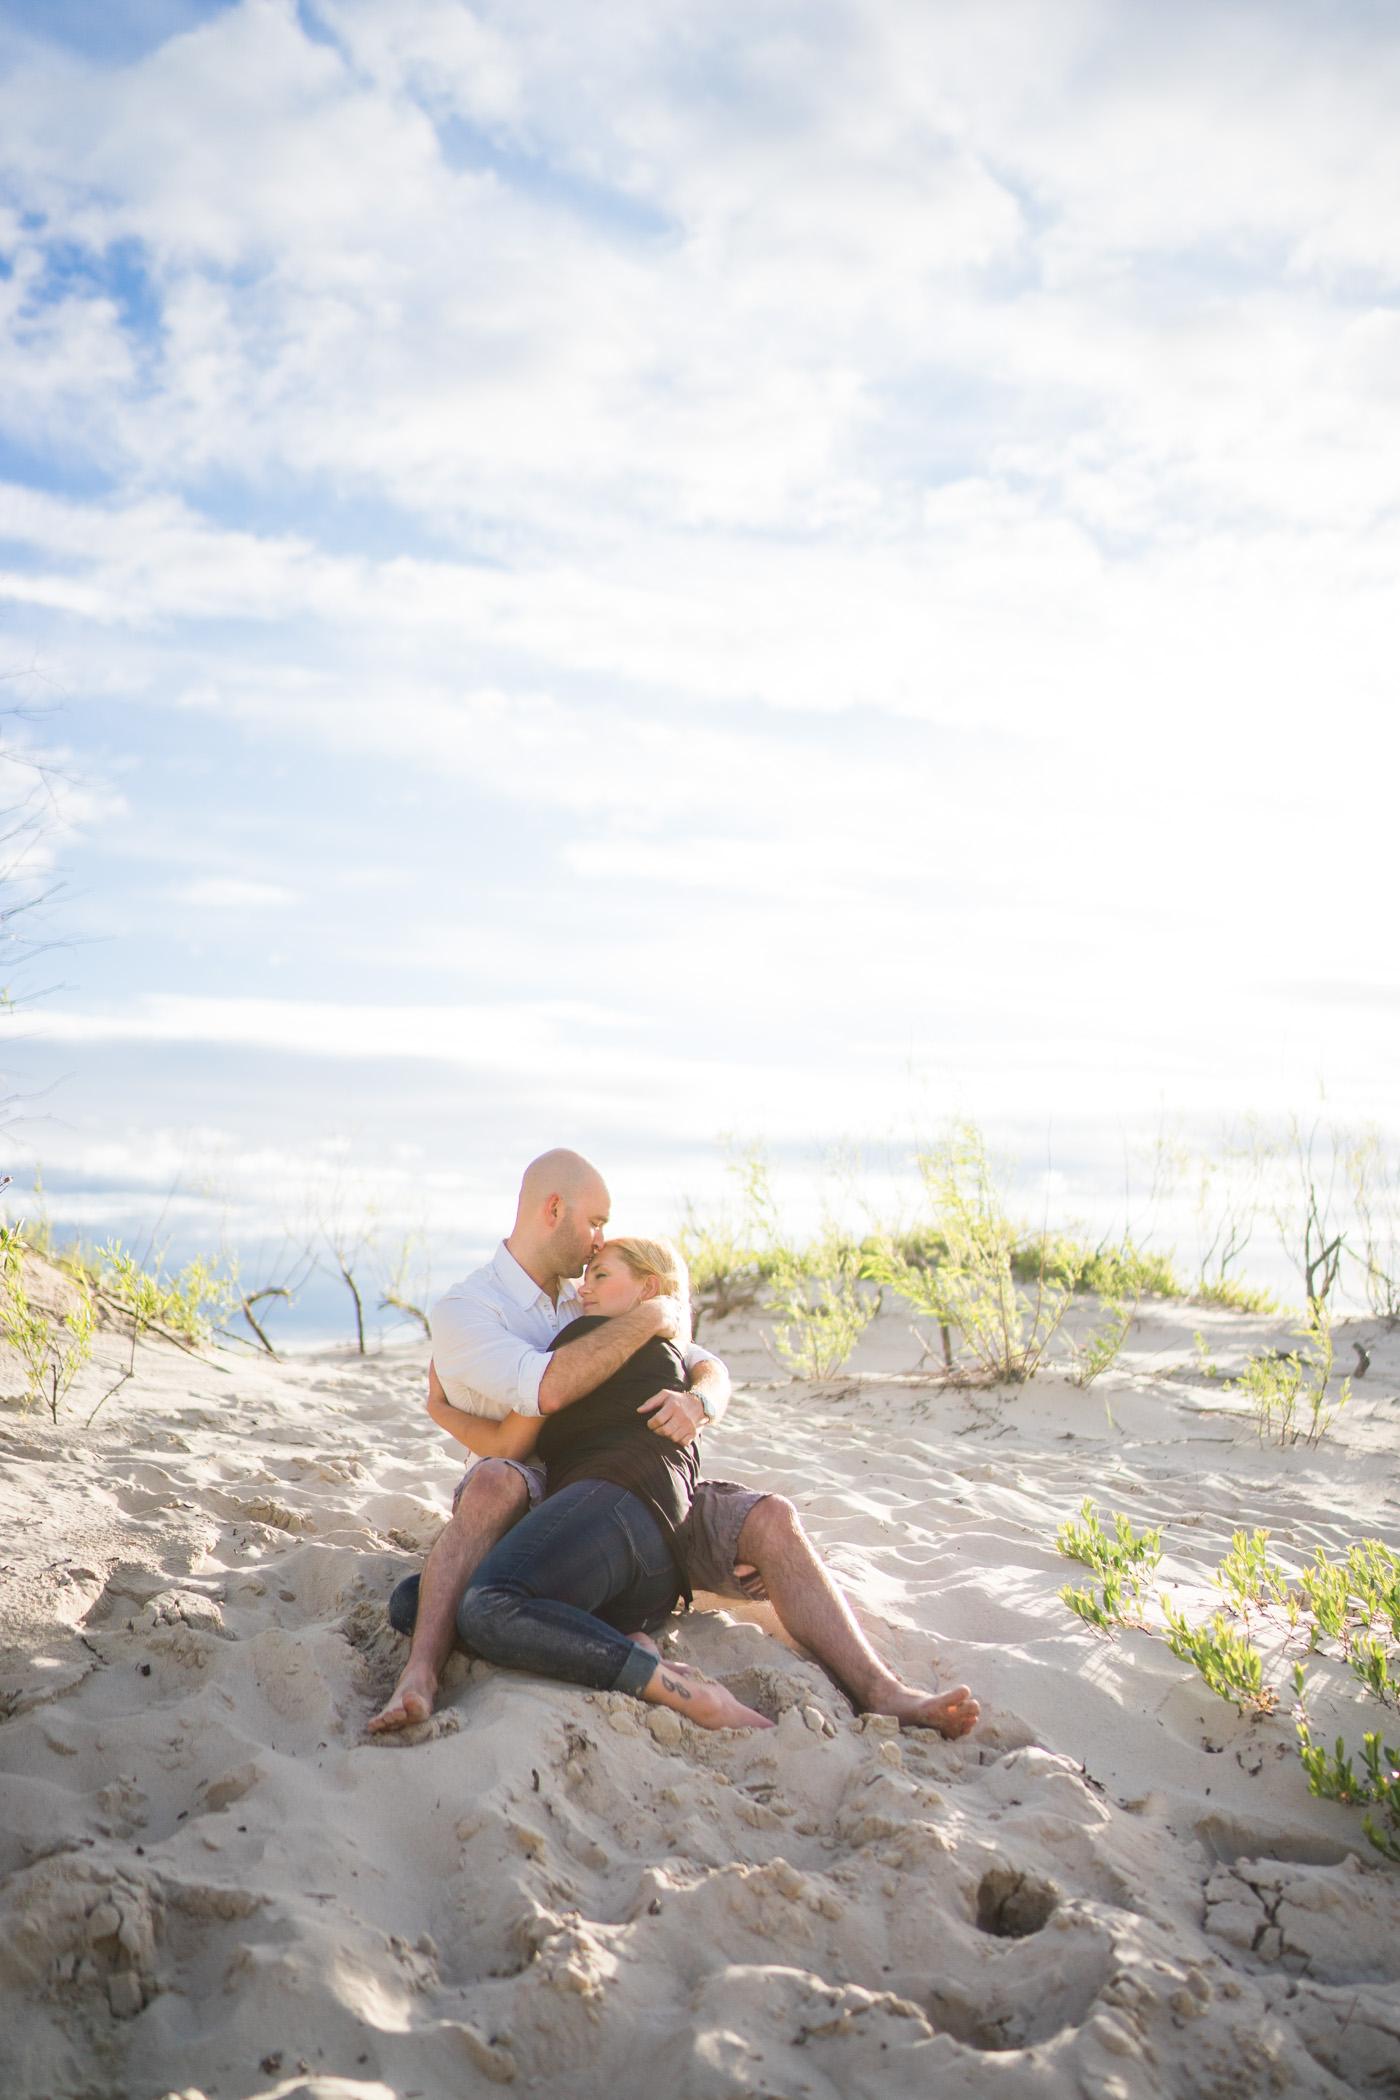 COJO Photo - Jenn and Adam - Engagement-341.jpg